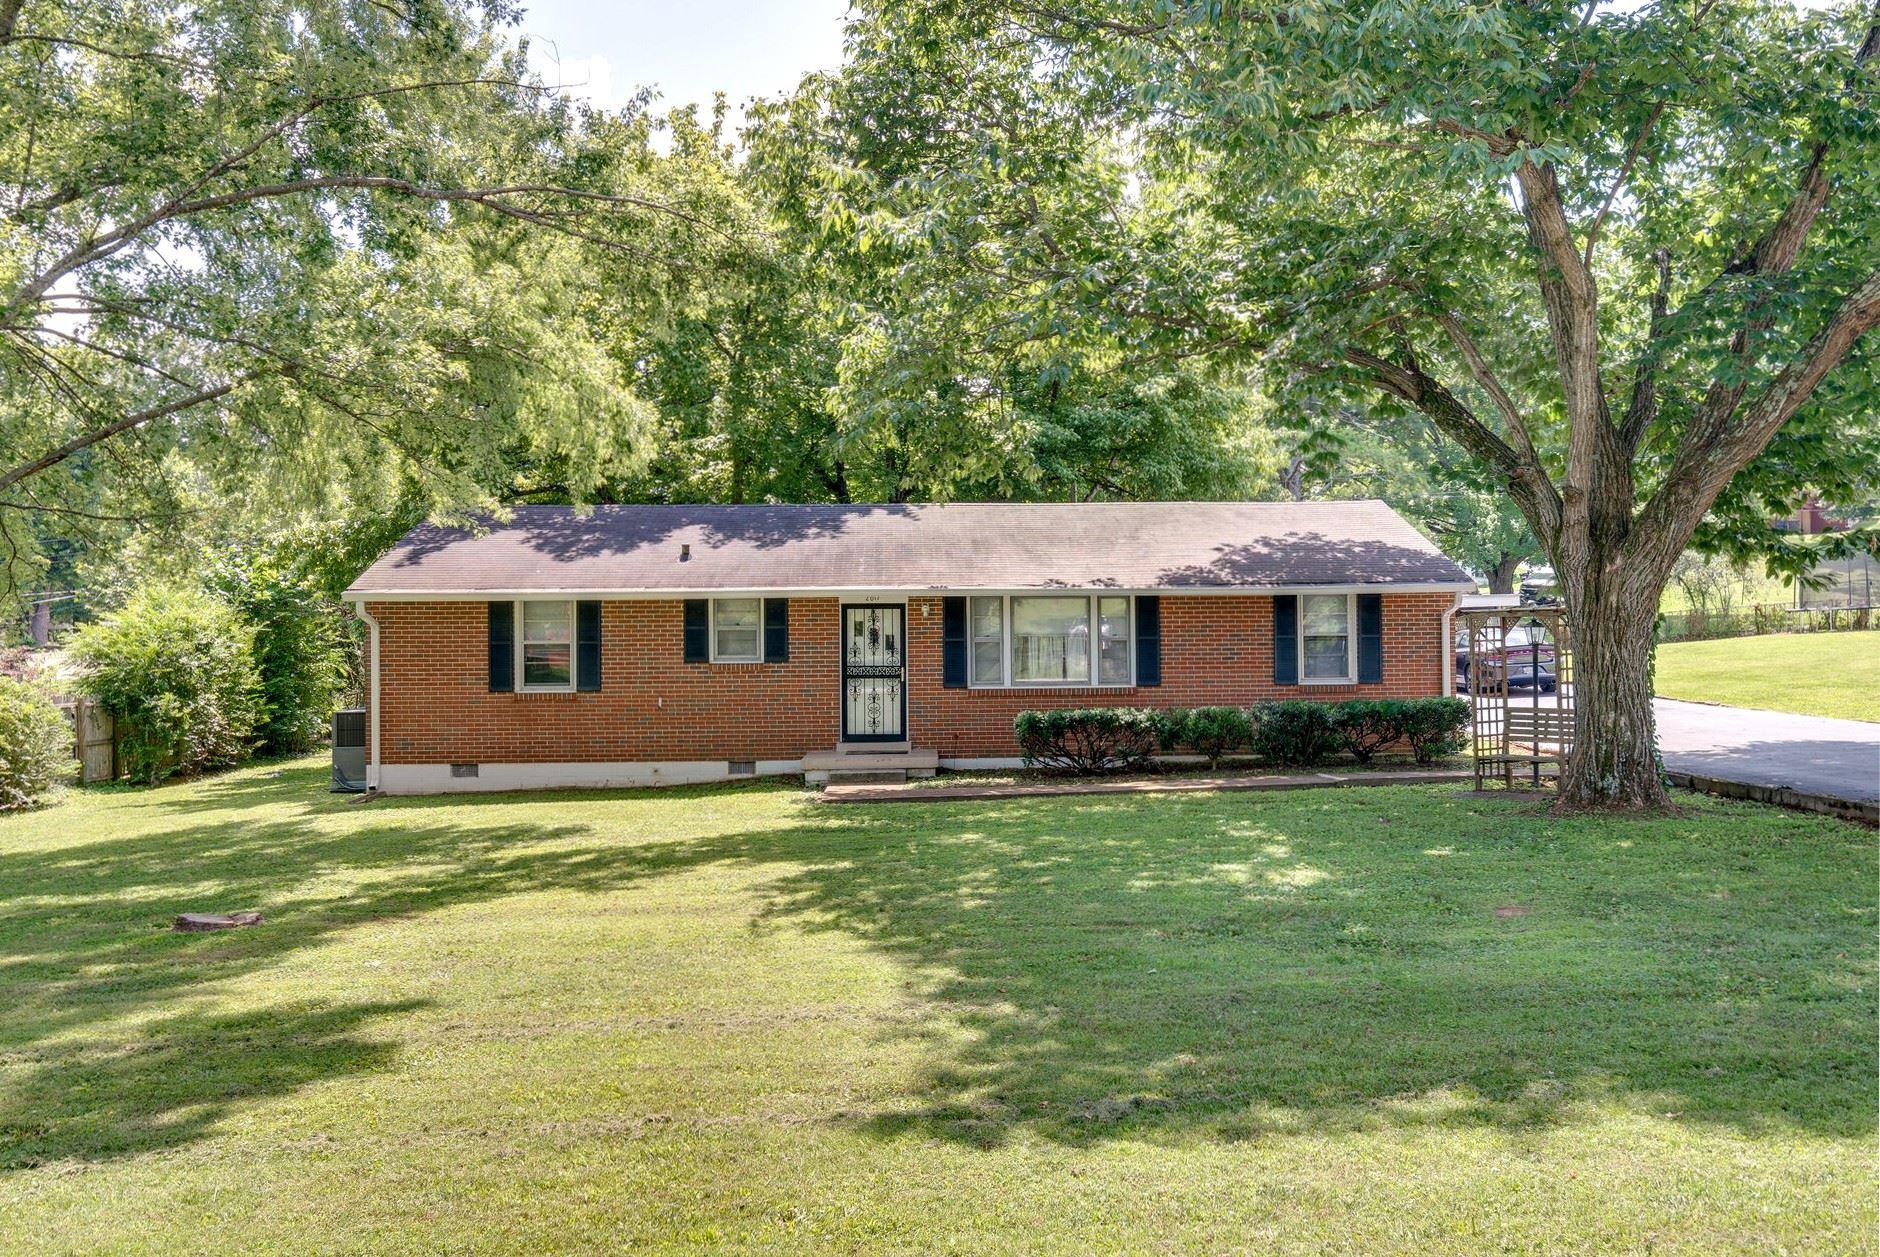 2017 Wedgewood Dr, Columbia, TN 38401 - MLS#: 2274240